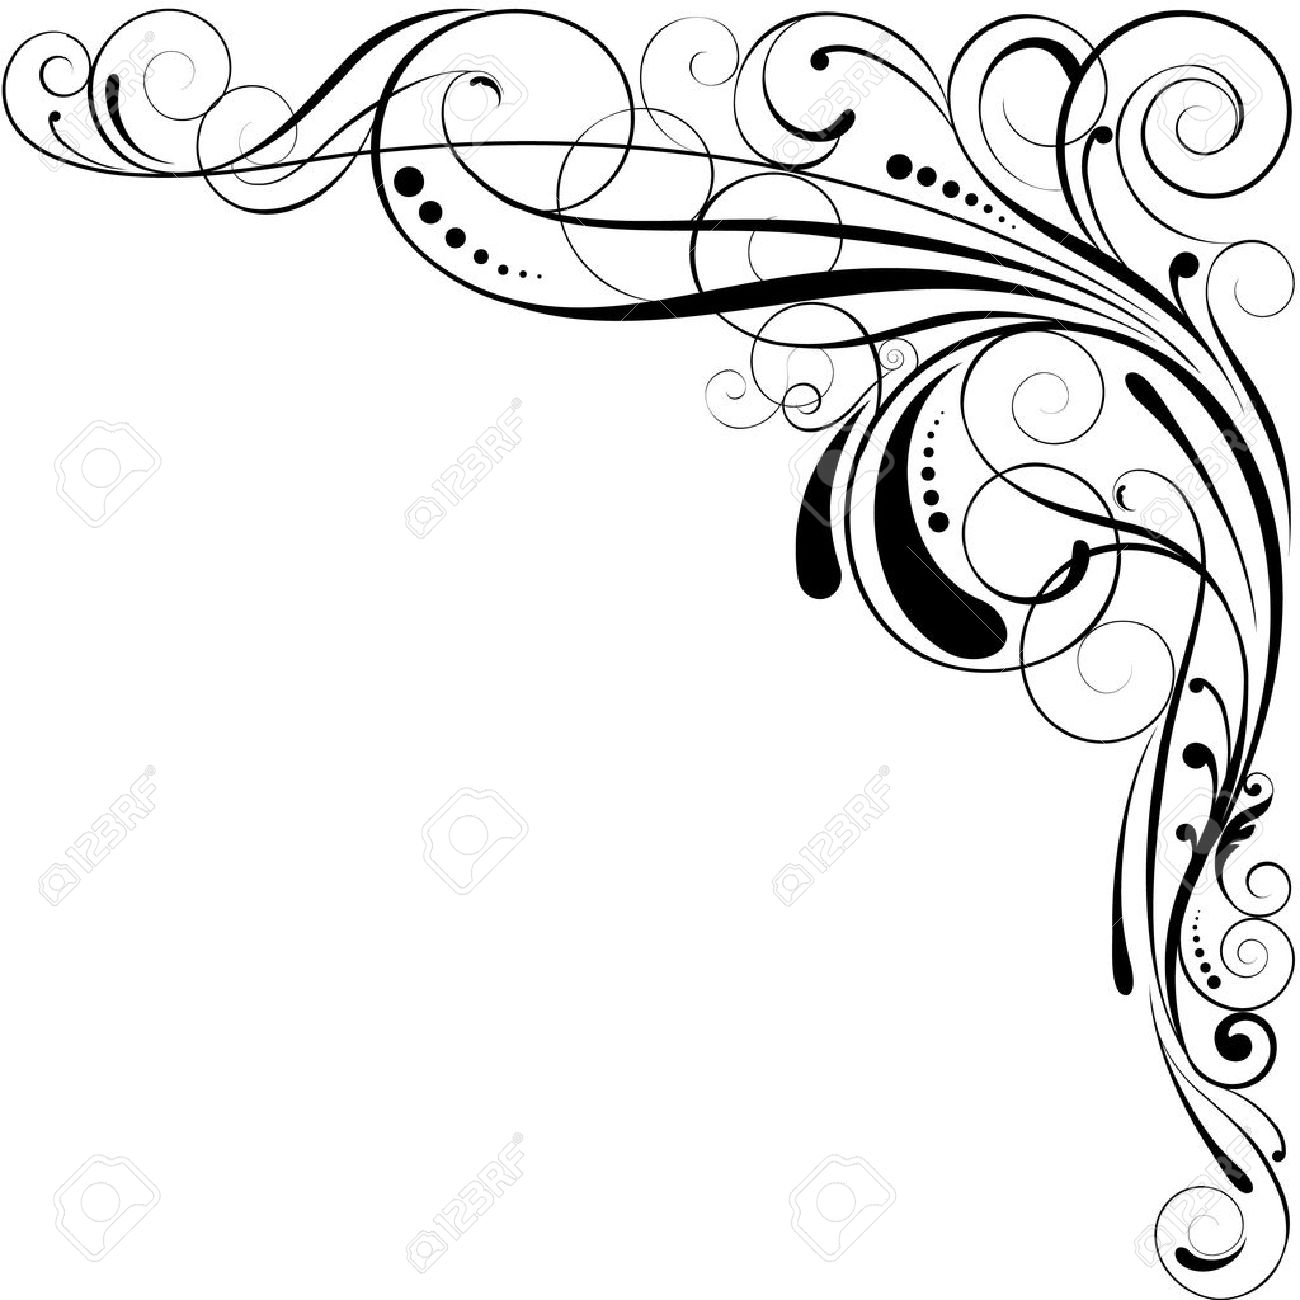 1300x1300 Simple Line Designs Swirls. Vector Victorian Ornamental Swirls